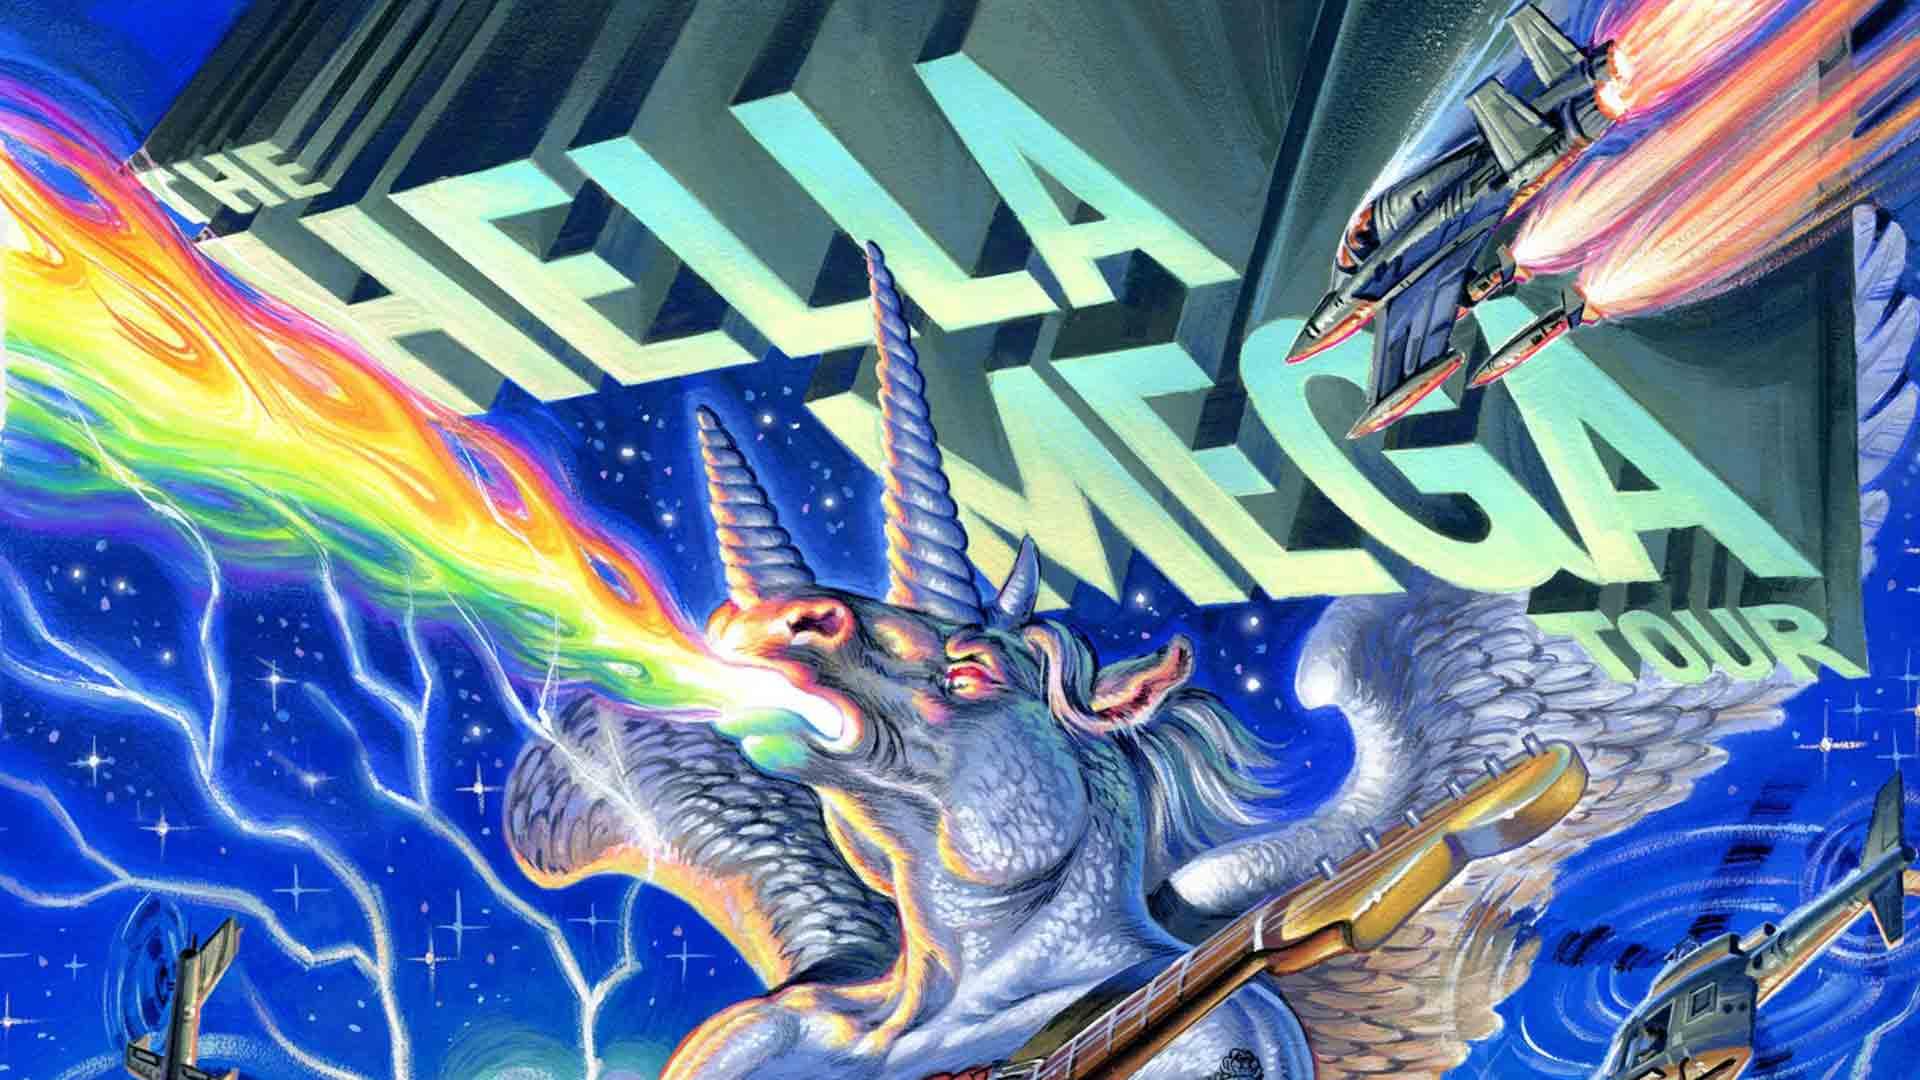 Hella Mega Tour:  NZ and AU Concerts No Longer Going Ahead